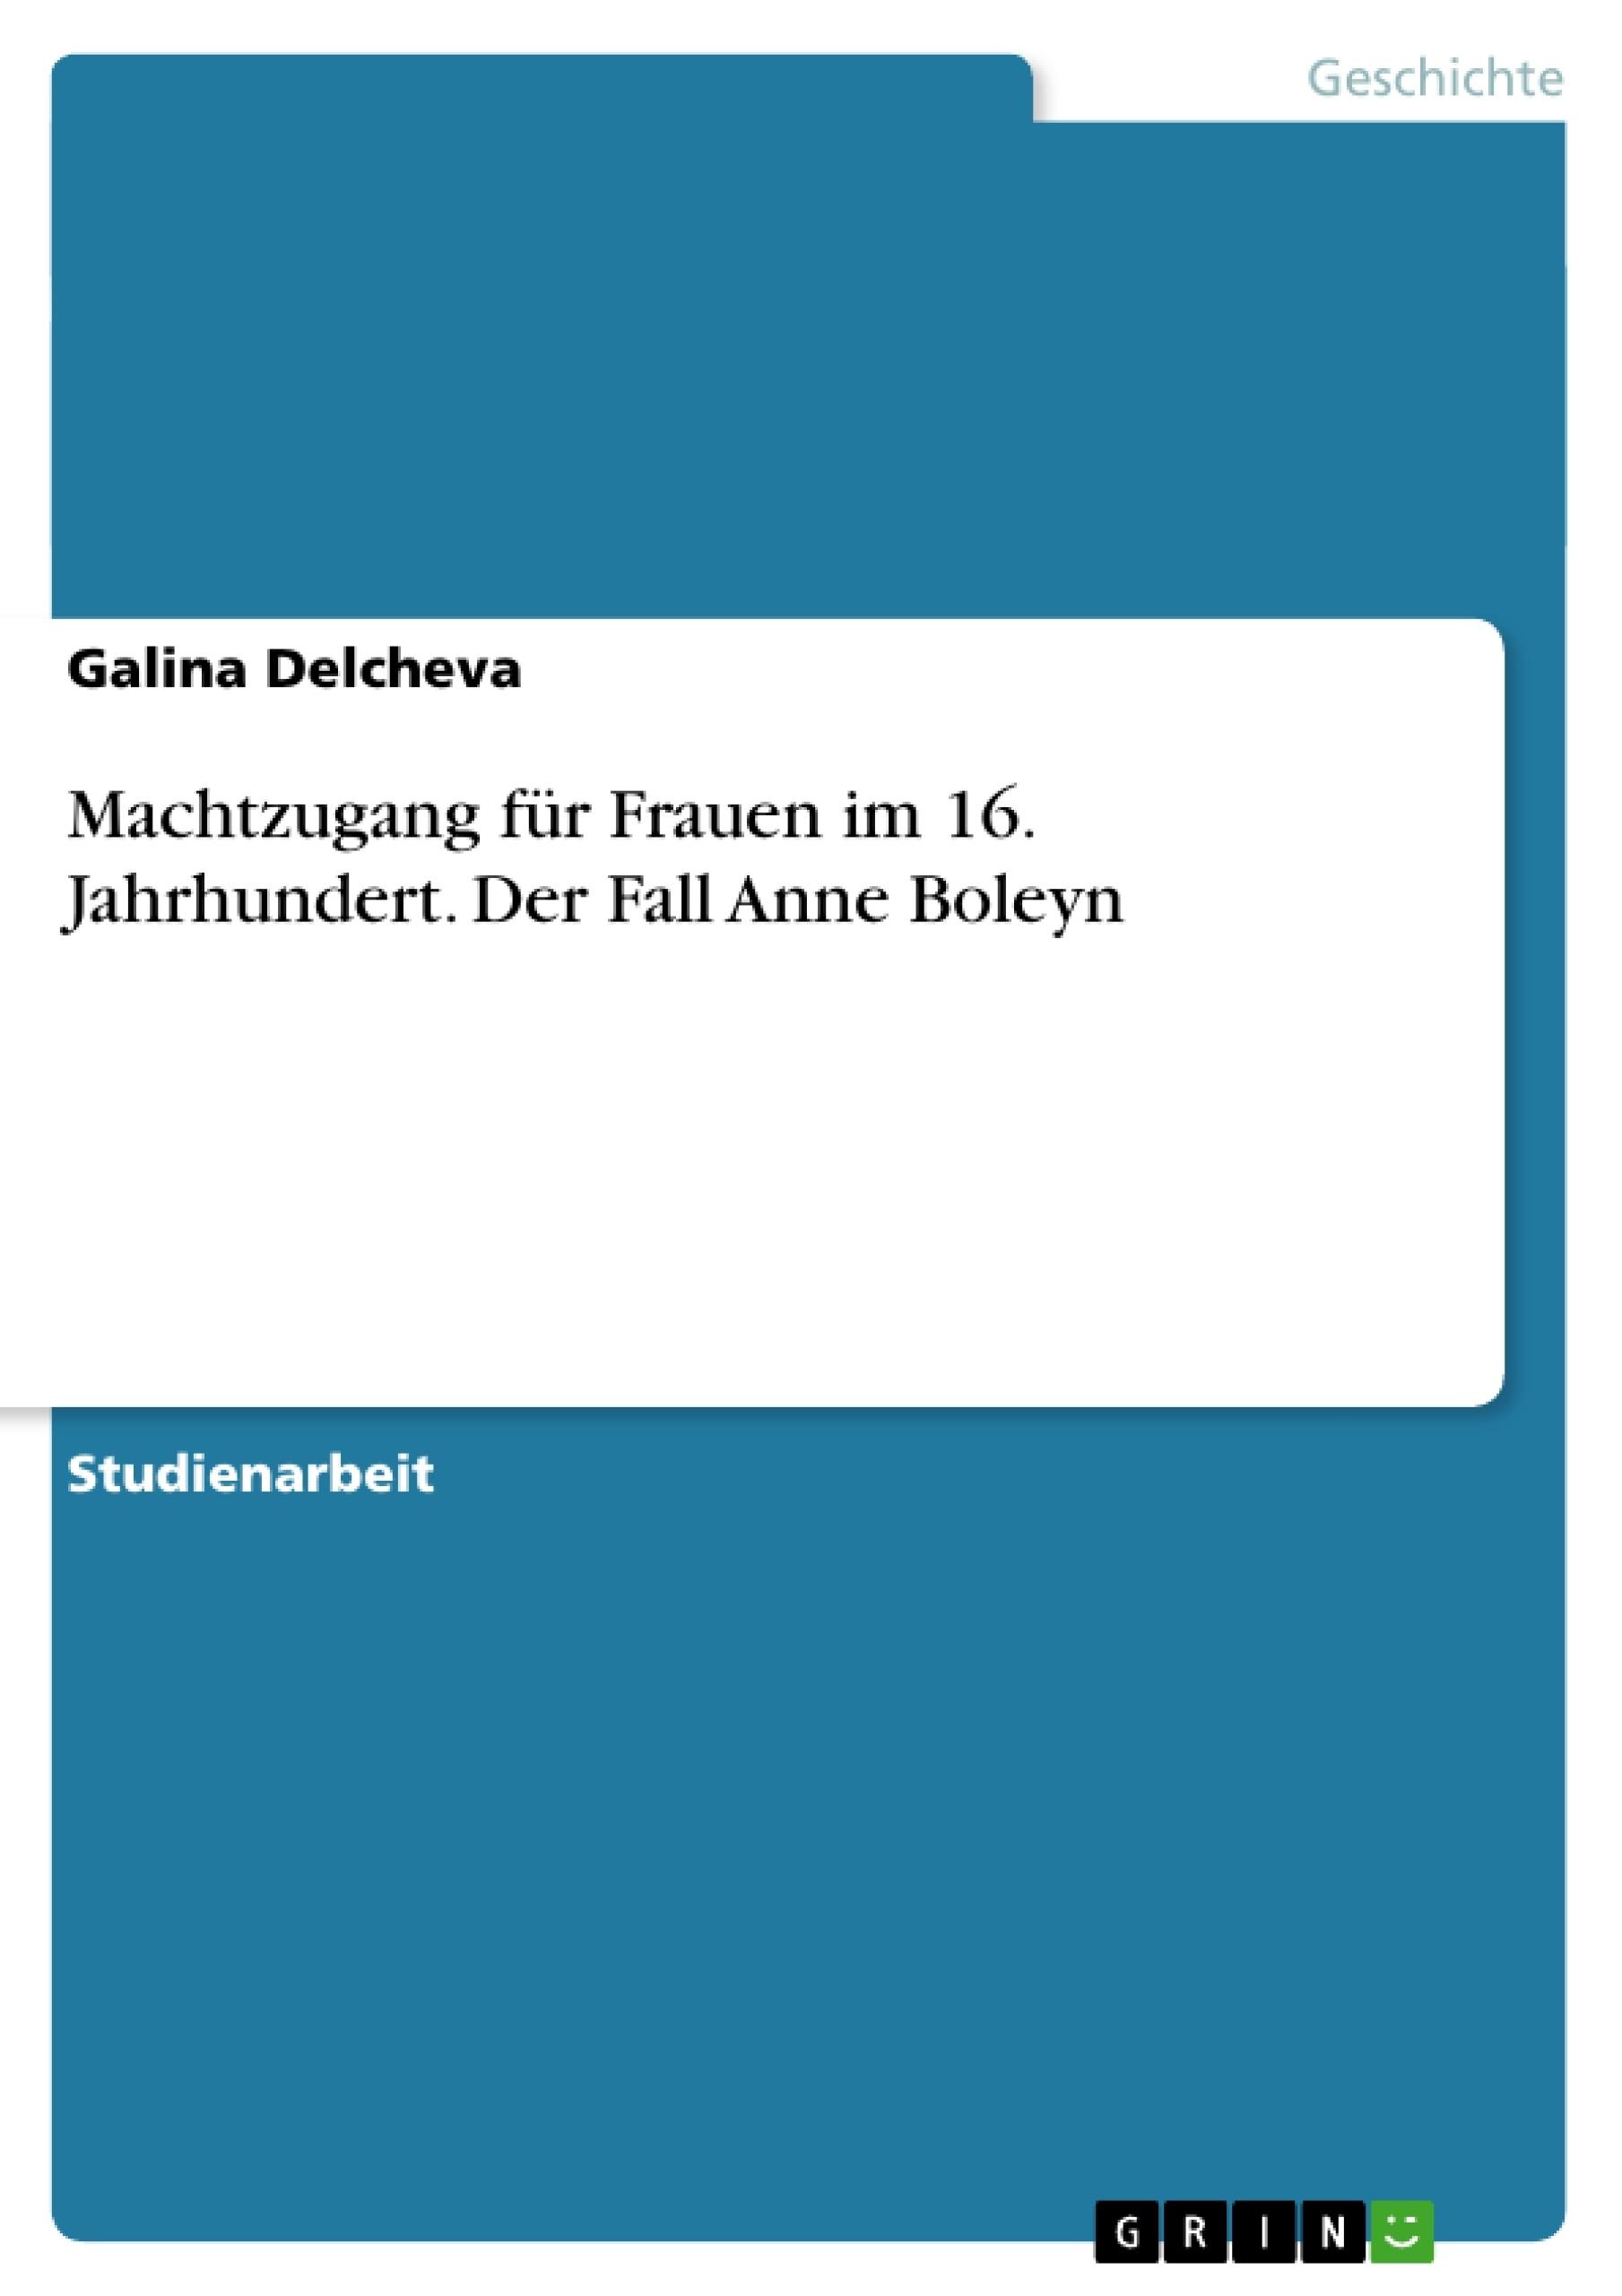 Titel: Machtzugang für Frauen im 16. Jahrhundert. Der Fall Anne Boleyn